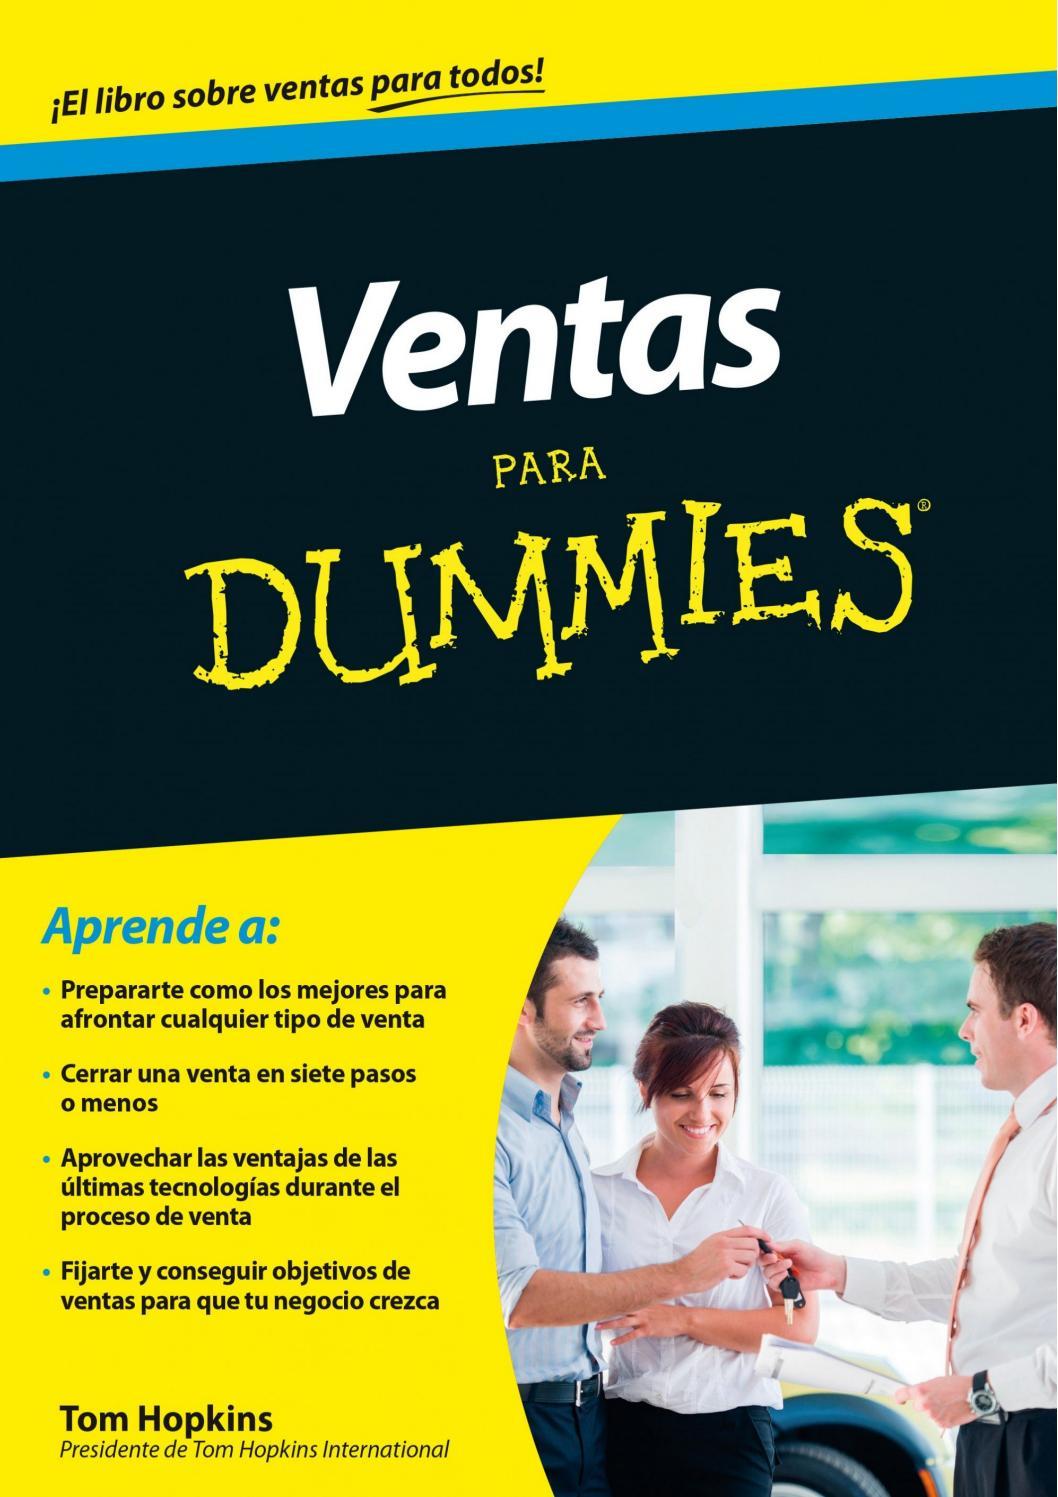 Ventas Para Dummies by yosoyelgaiusclaudius - issuu